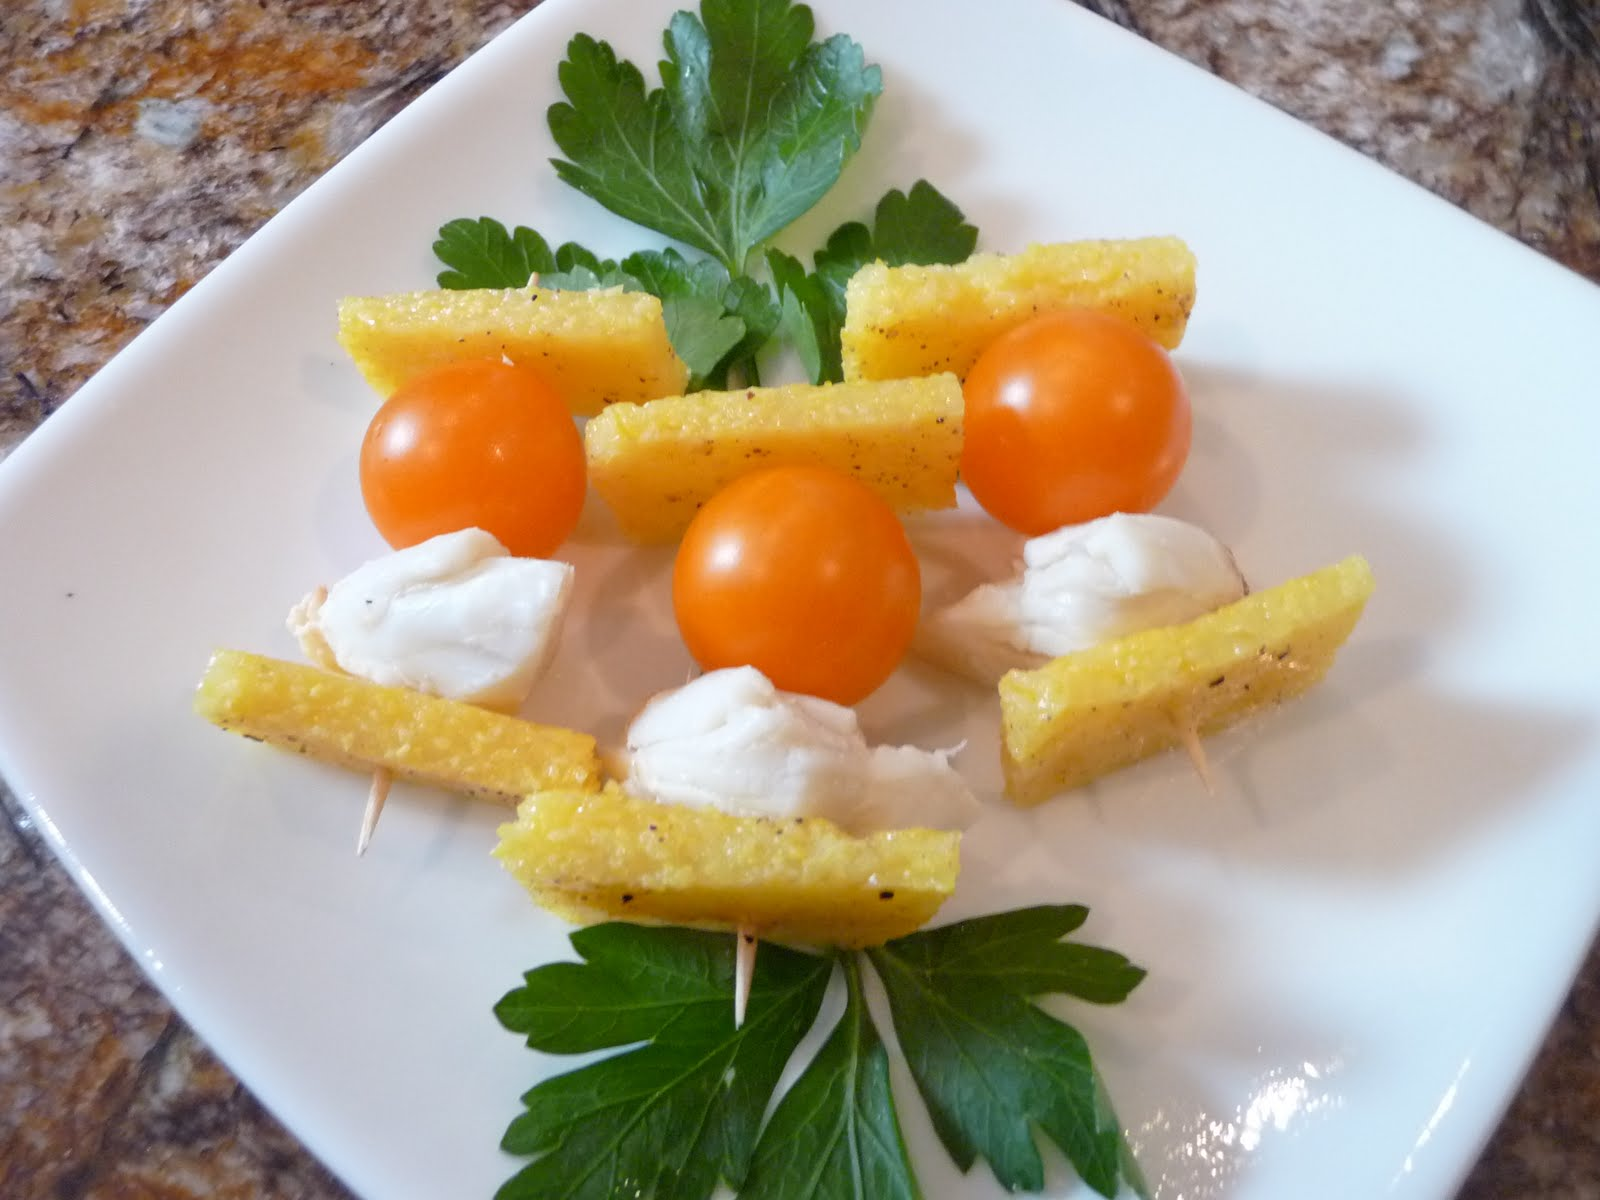 Chef Bolek: Polenta Bites with Tomatoes and Crab